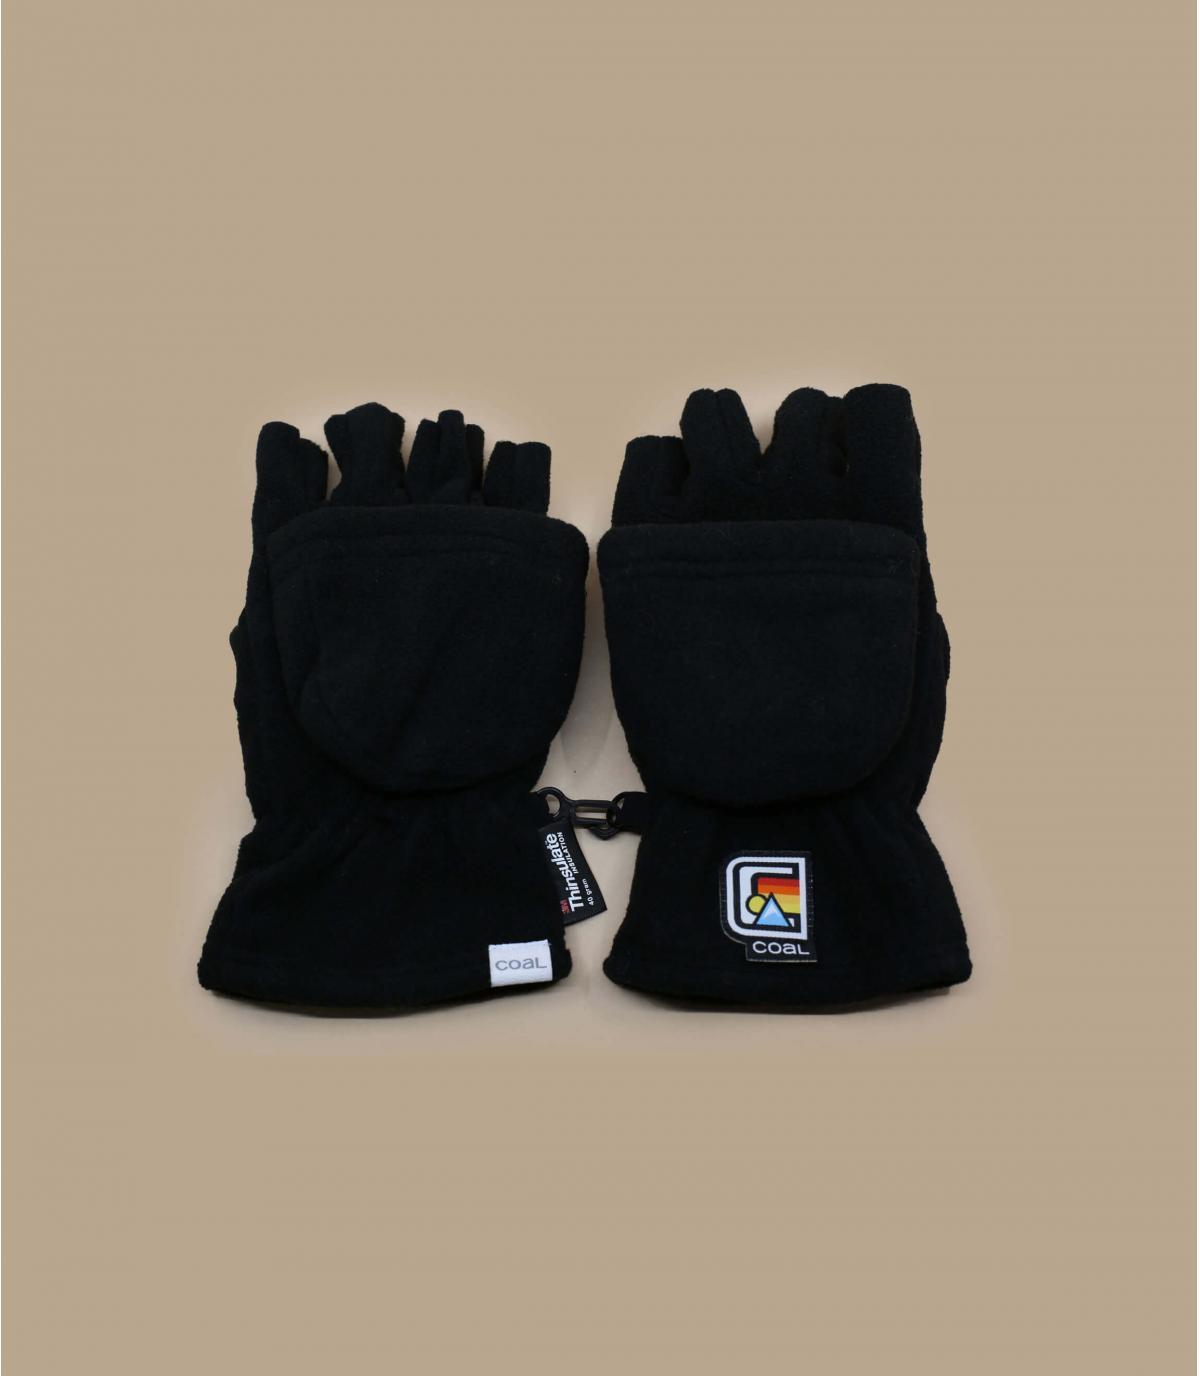 black mitten gloves Coal